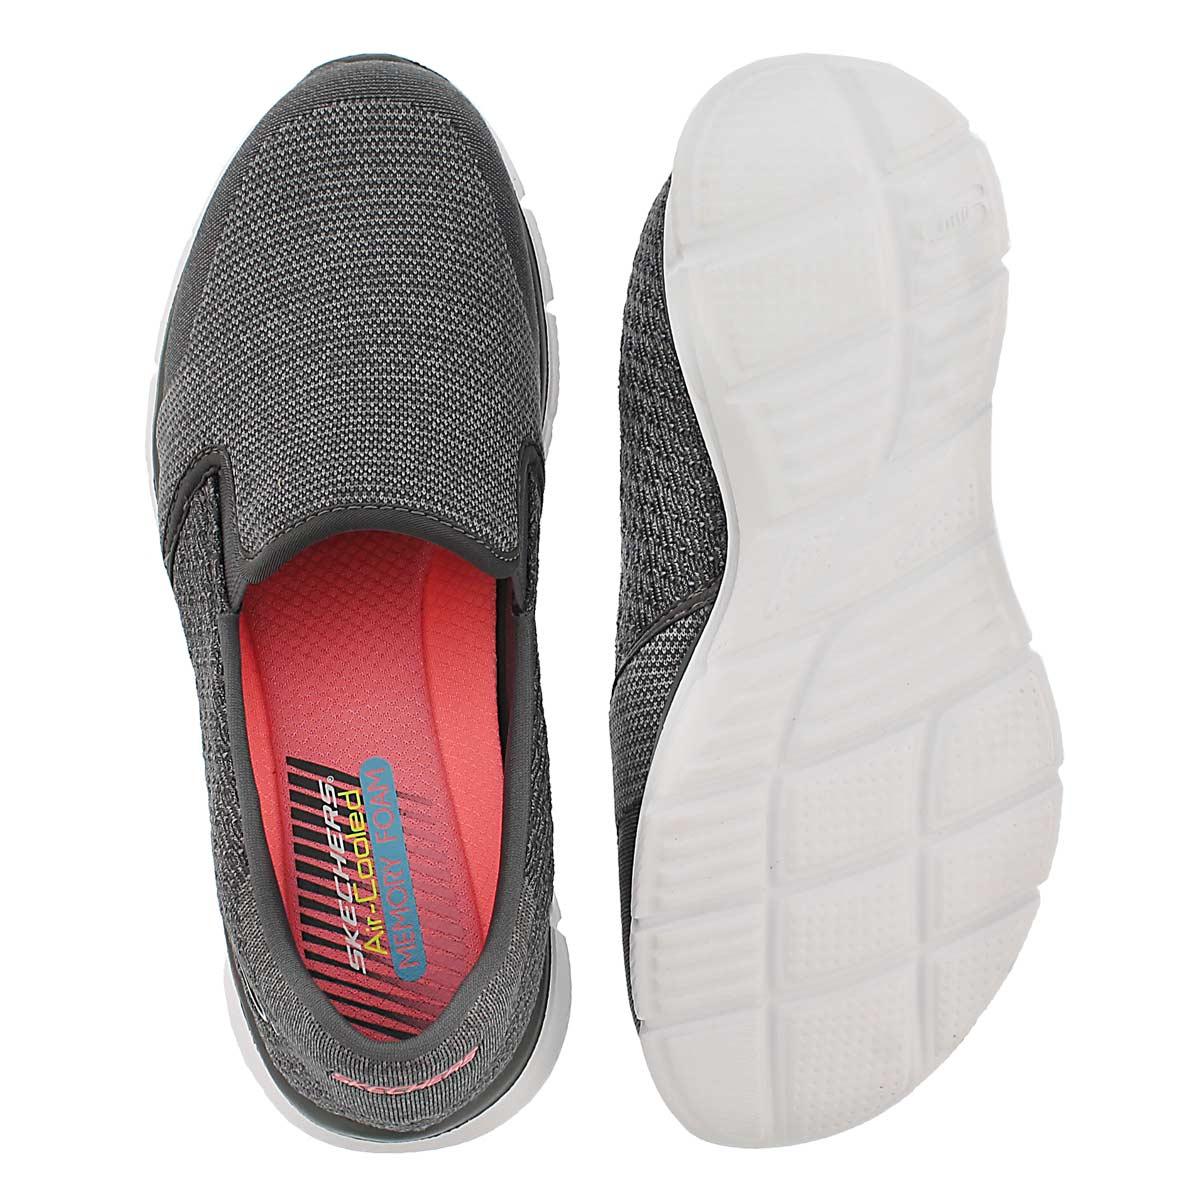 Lds Say Something grey slip on sneaker